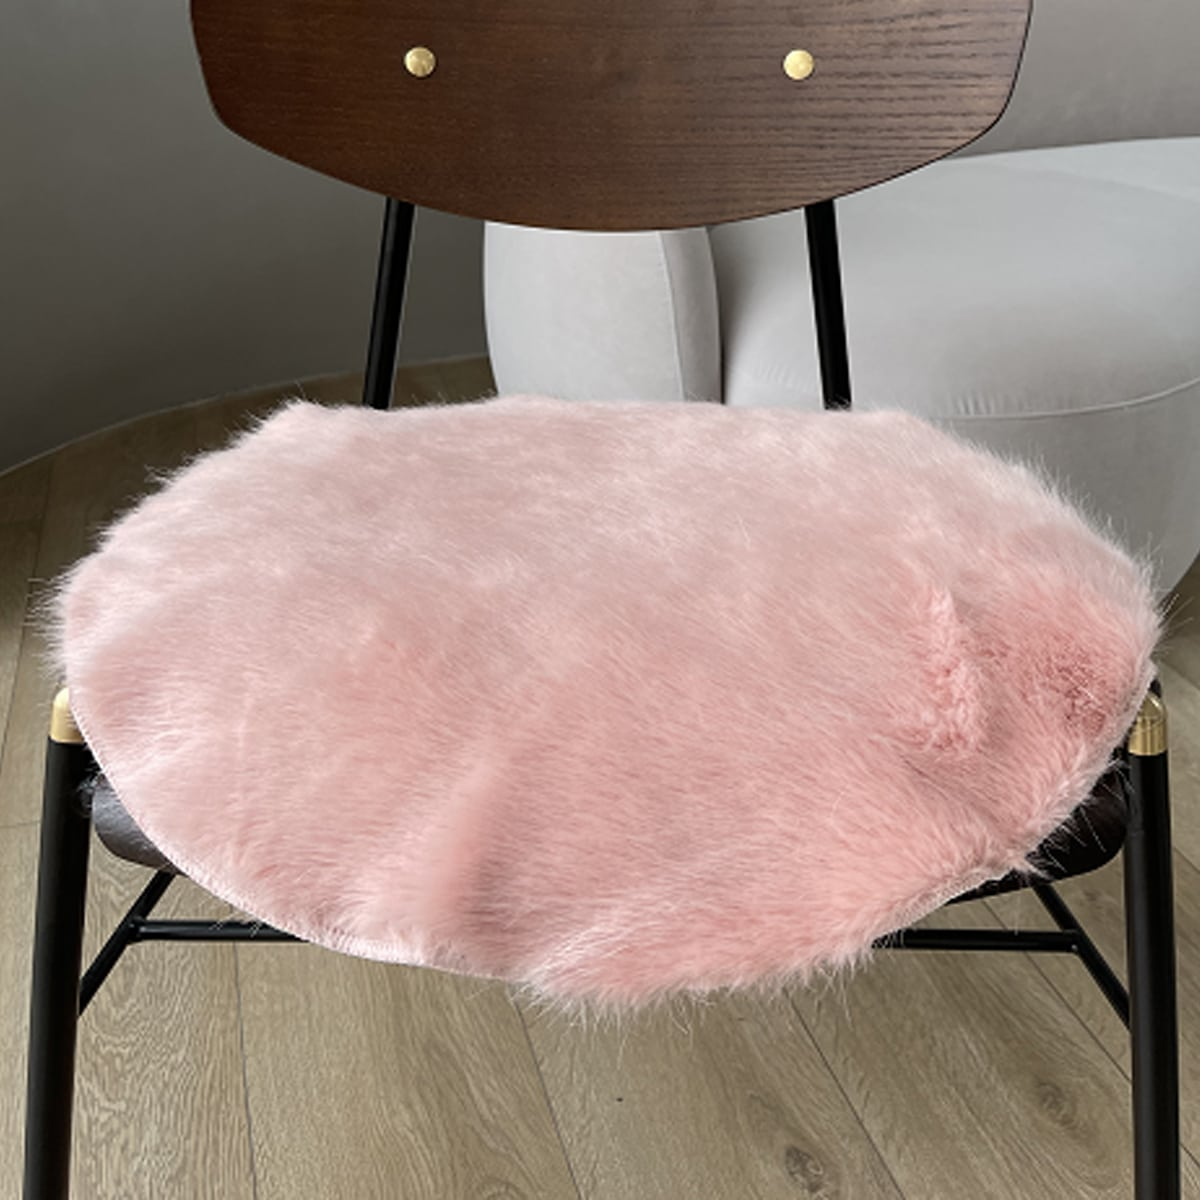 Flaumiger runder Teppich